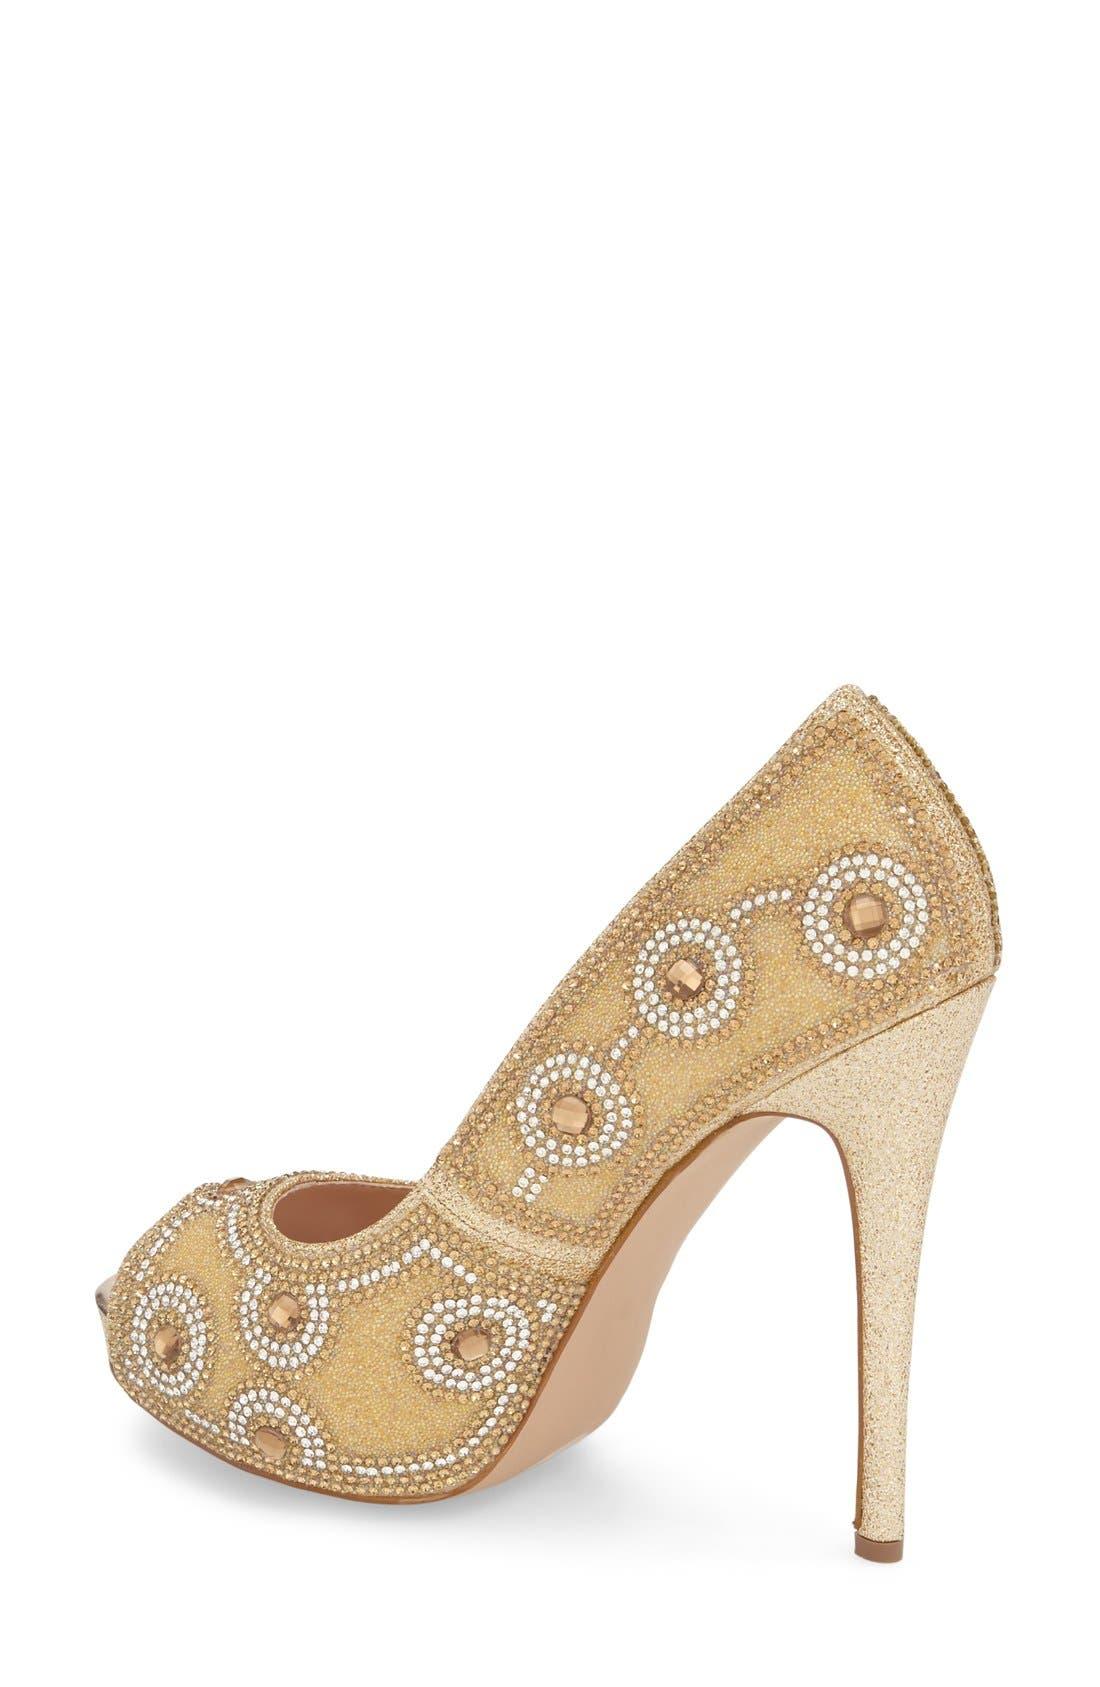 Alternate Image 2  - Lauren Lorraine 'Elenor' Crystal Embellished Peep Toe Pump (Women)